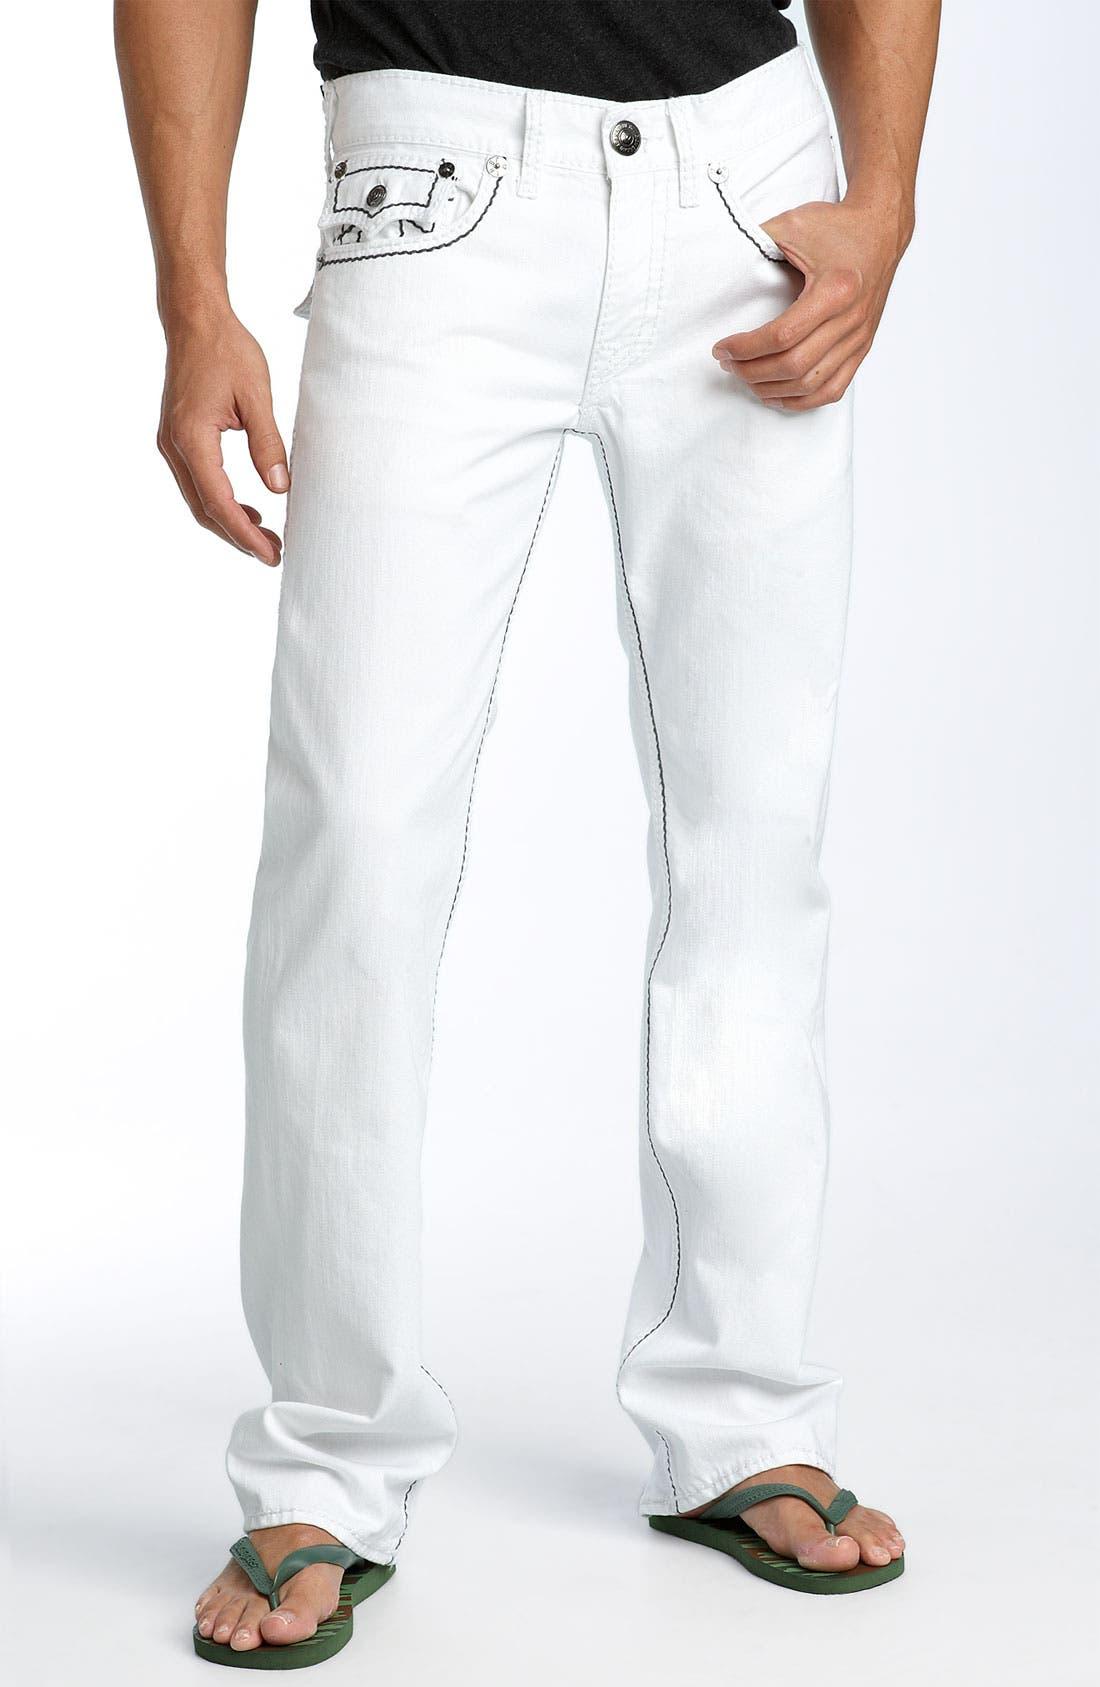 'Ricky - Giant Big T' Straight Leg Jeans,                             Alternate thumbnail 2, color,                             Body Rinse White